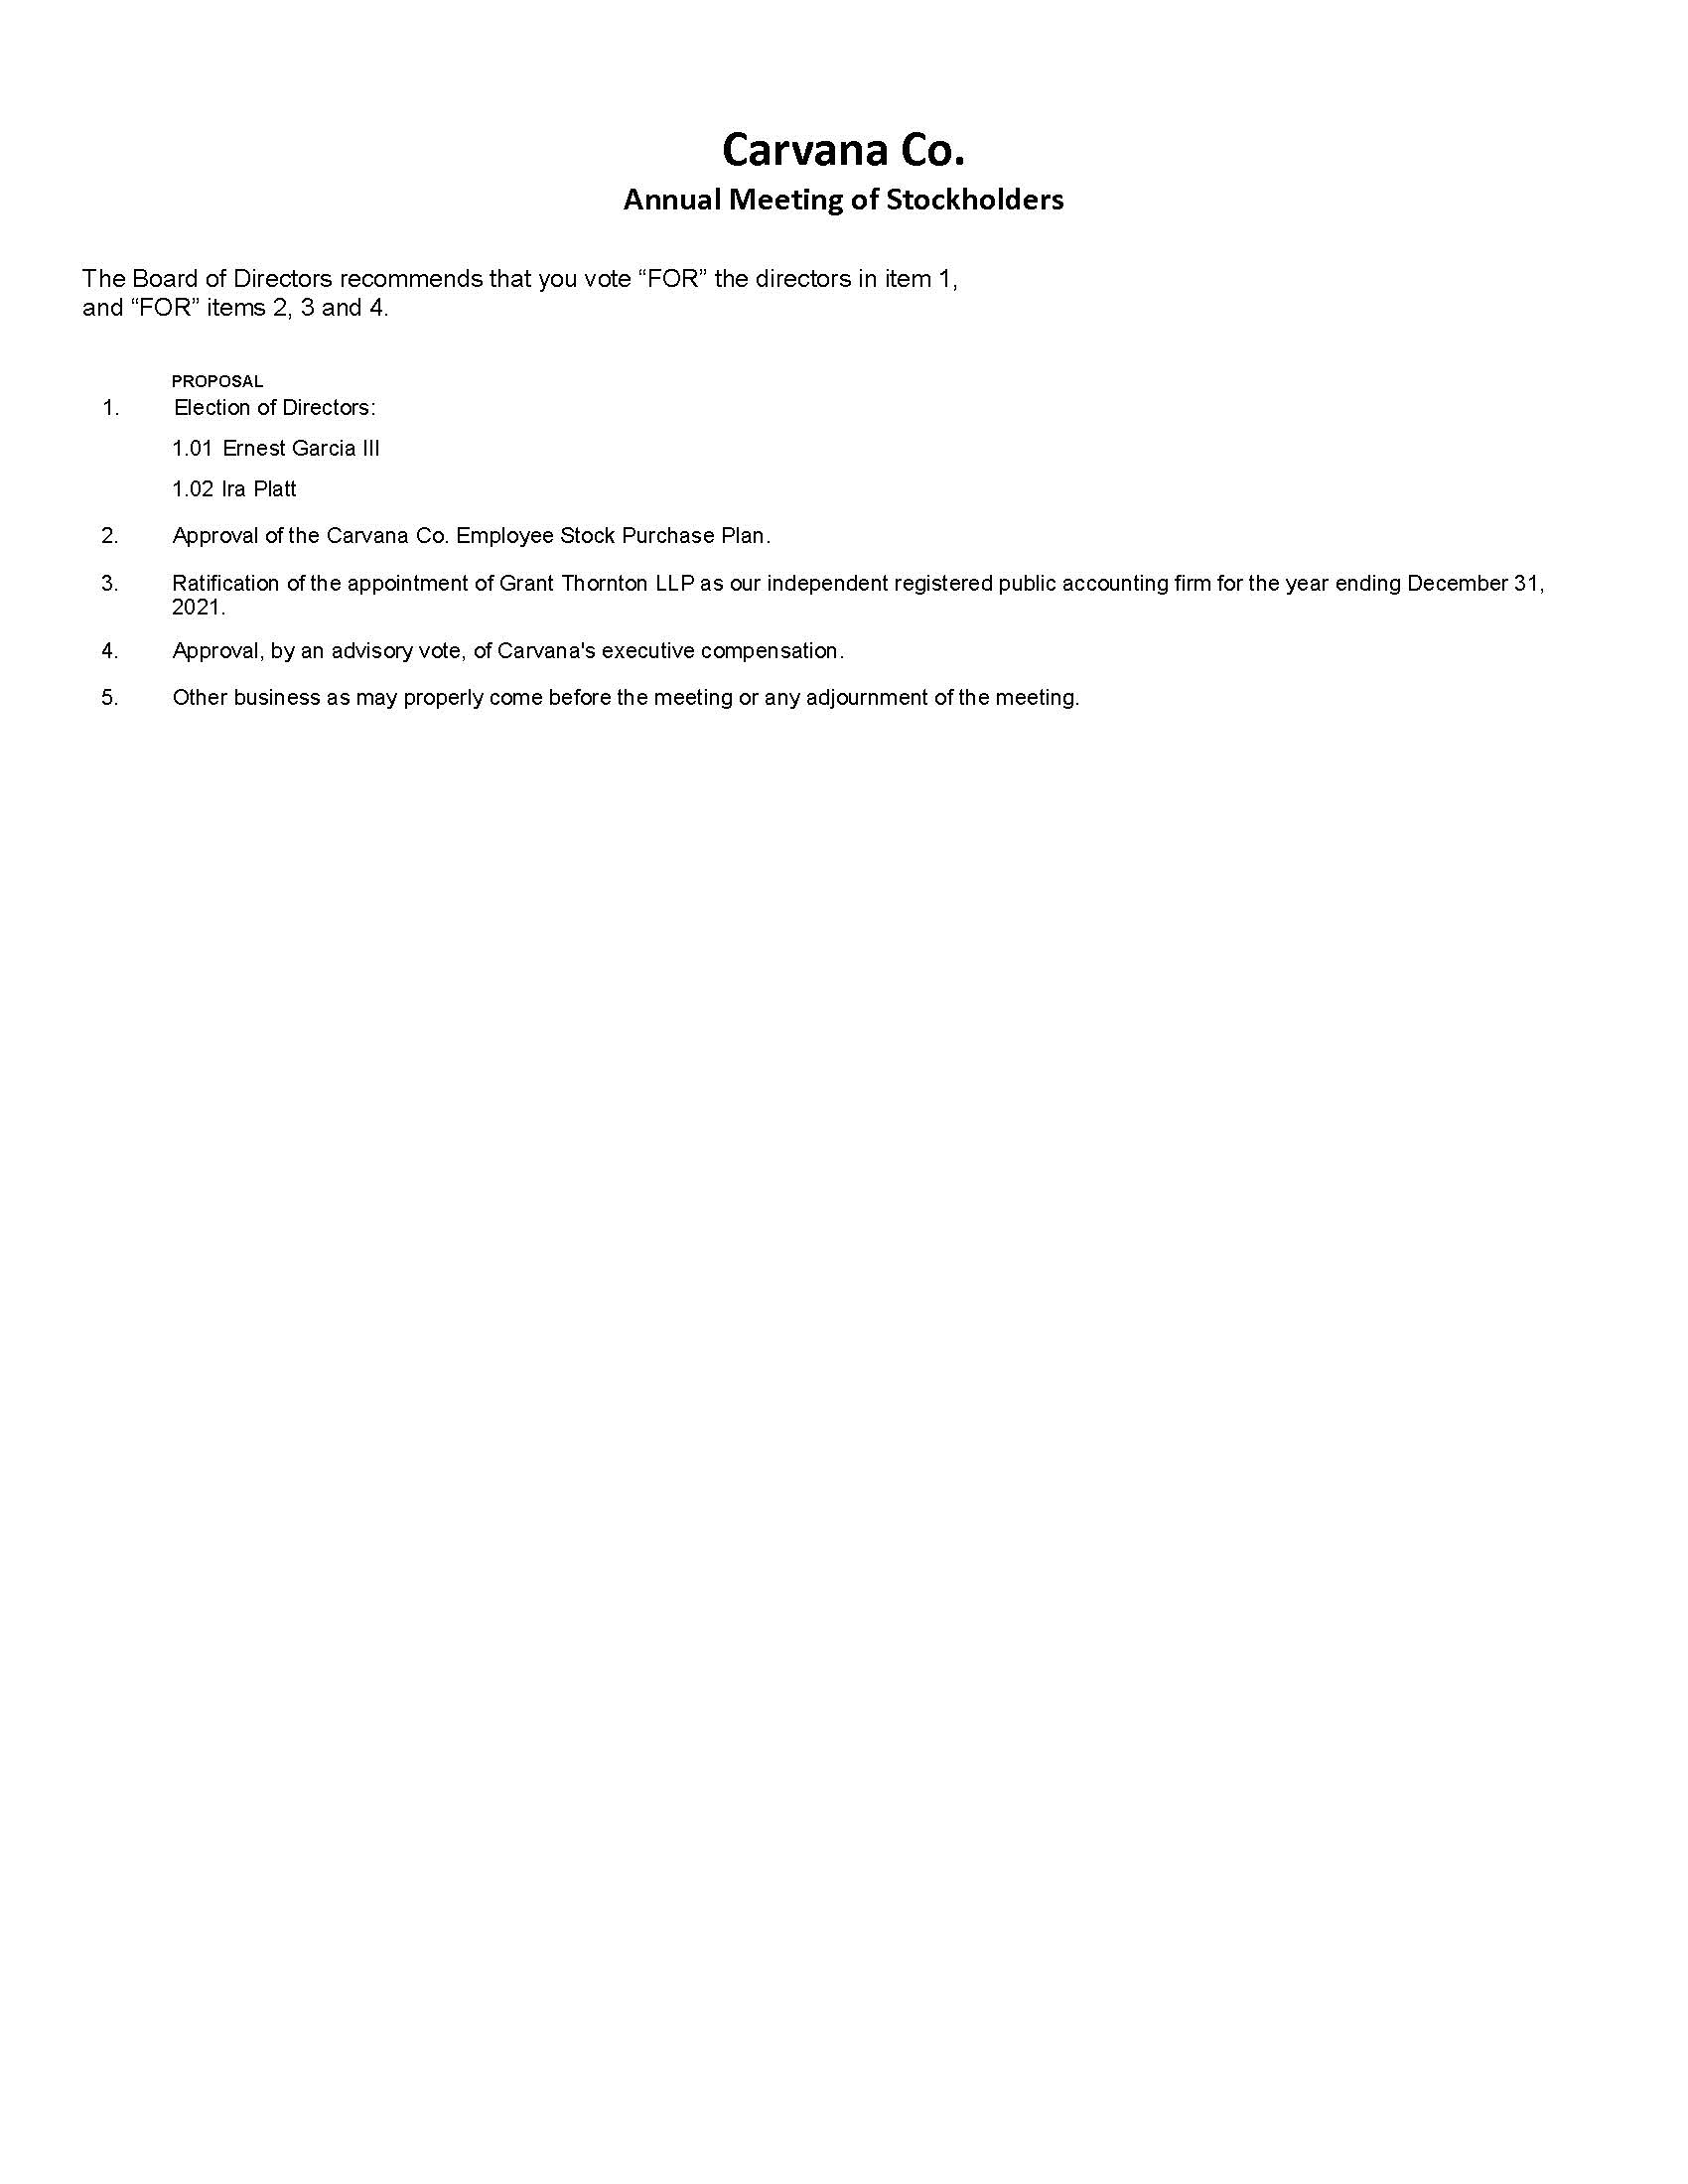 PROXYCARD_PAGEX21A.JPG